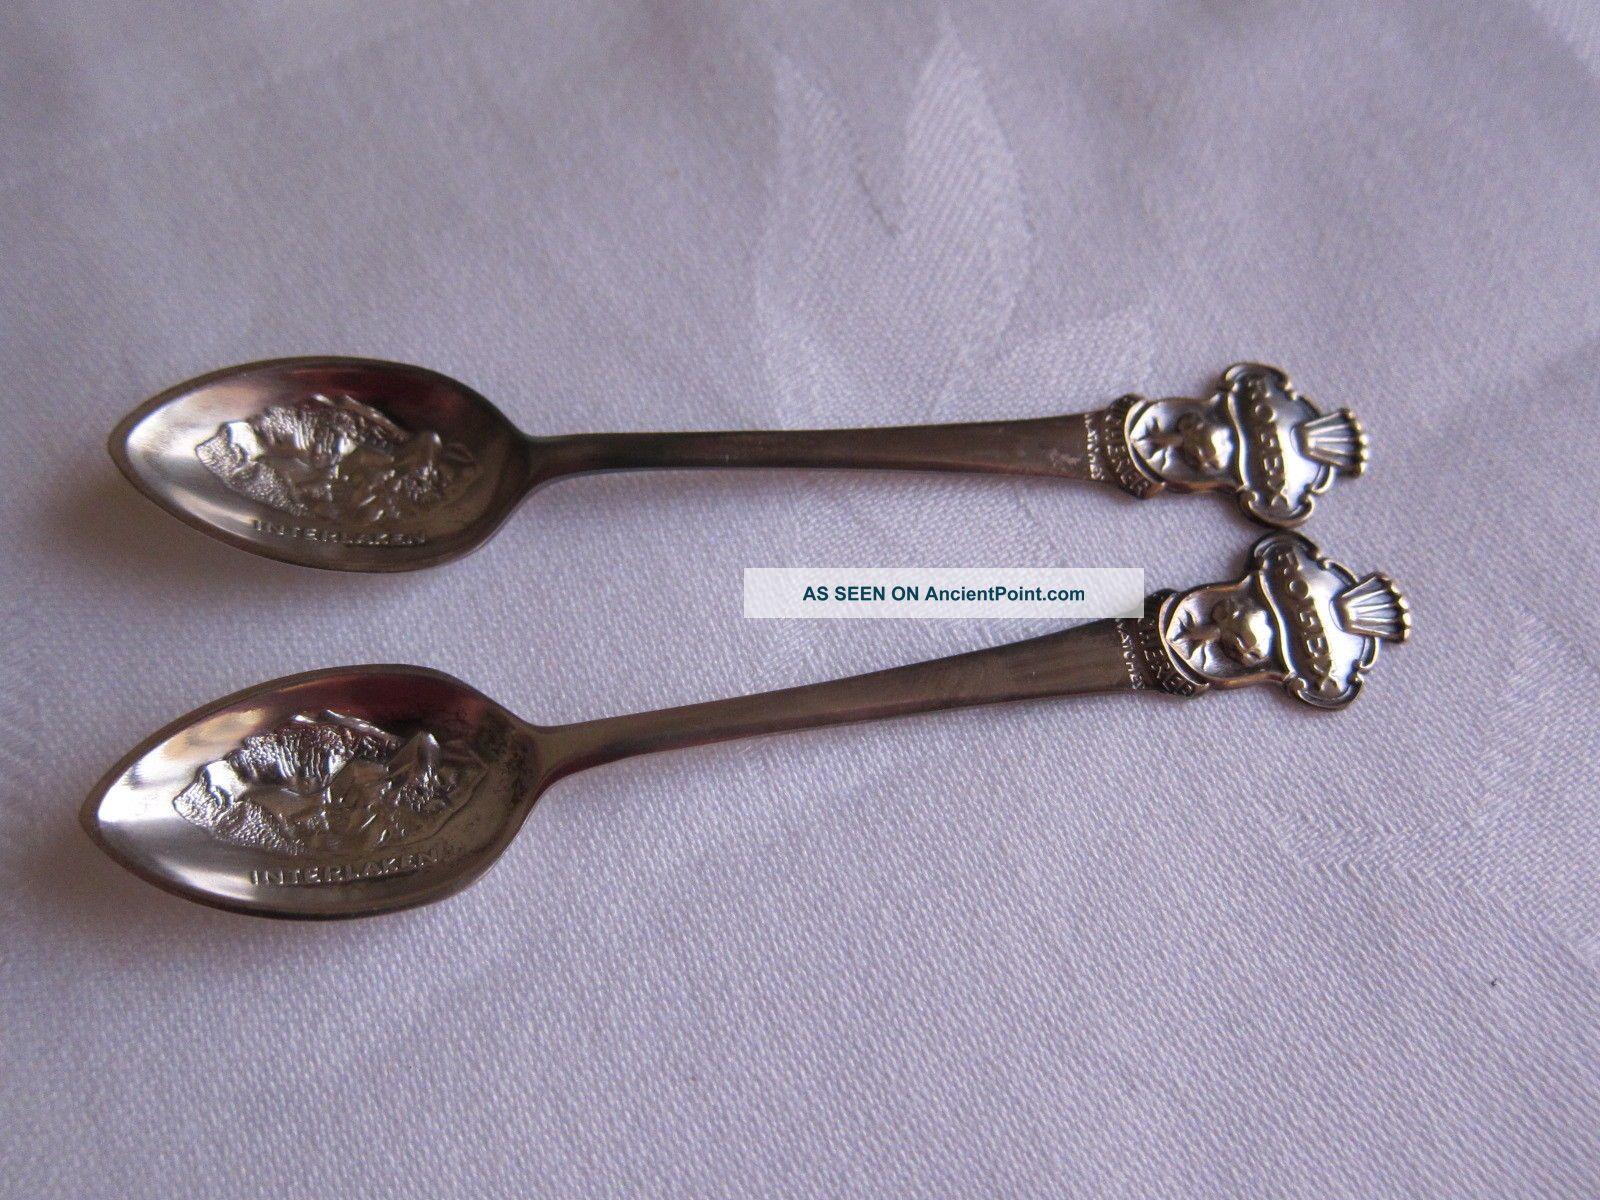 Vintage Rolex Bucherer Interlaken Silverplated Gift Demi Tasse Spoons Souvenir Spoons photo